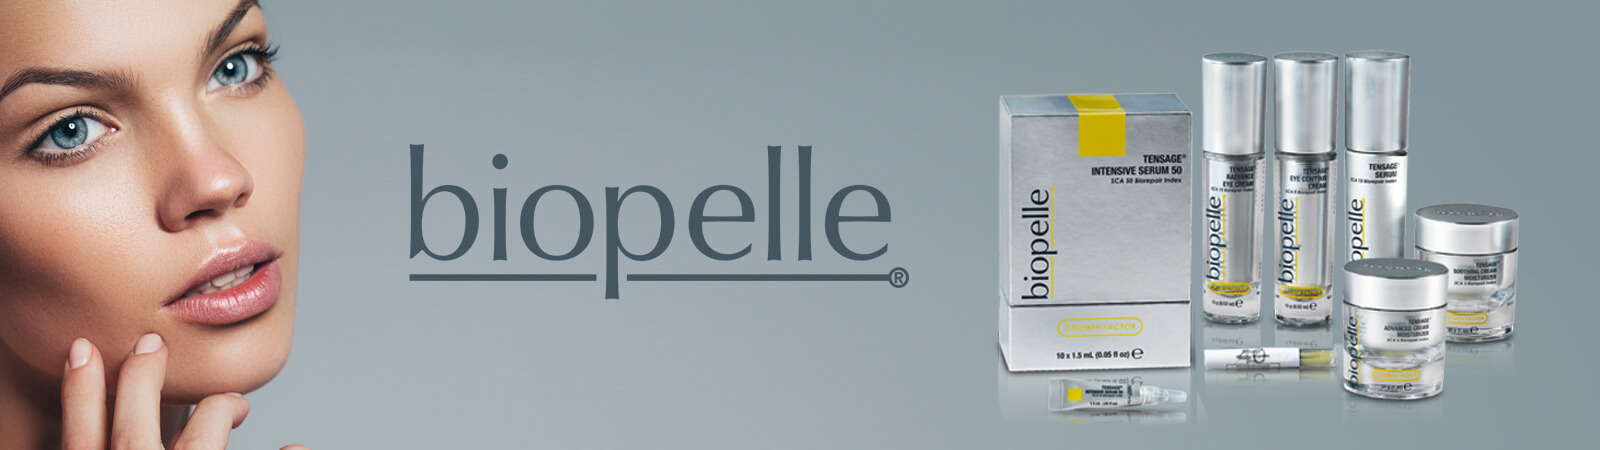 Biopelle Skin Care